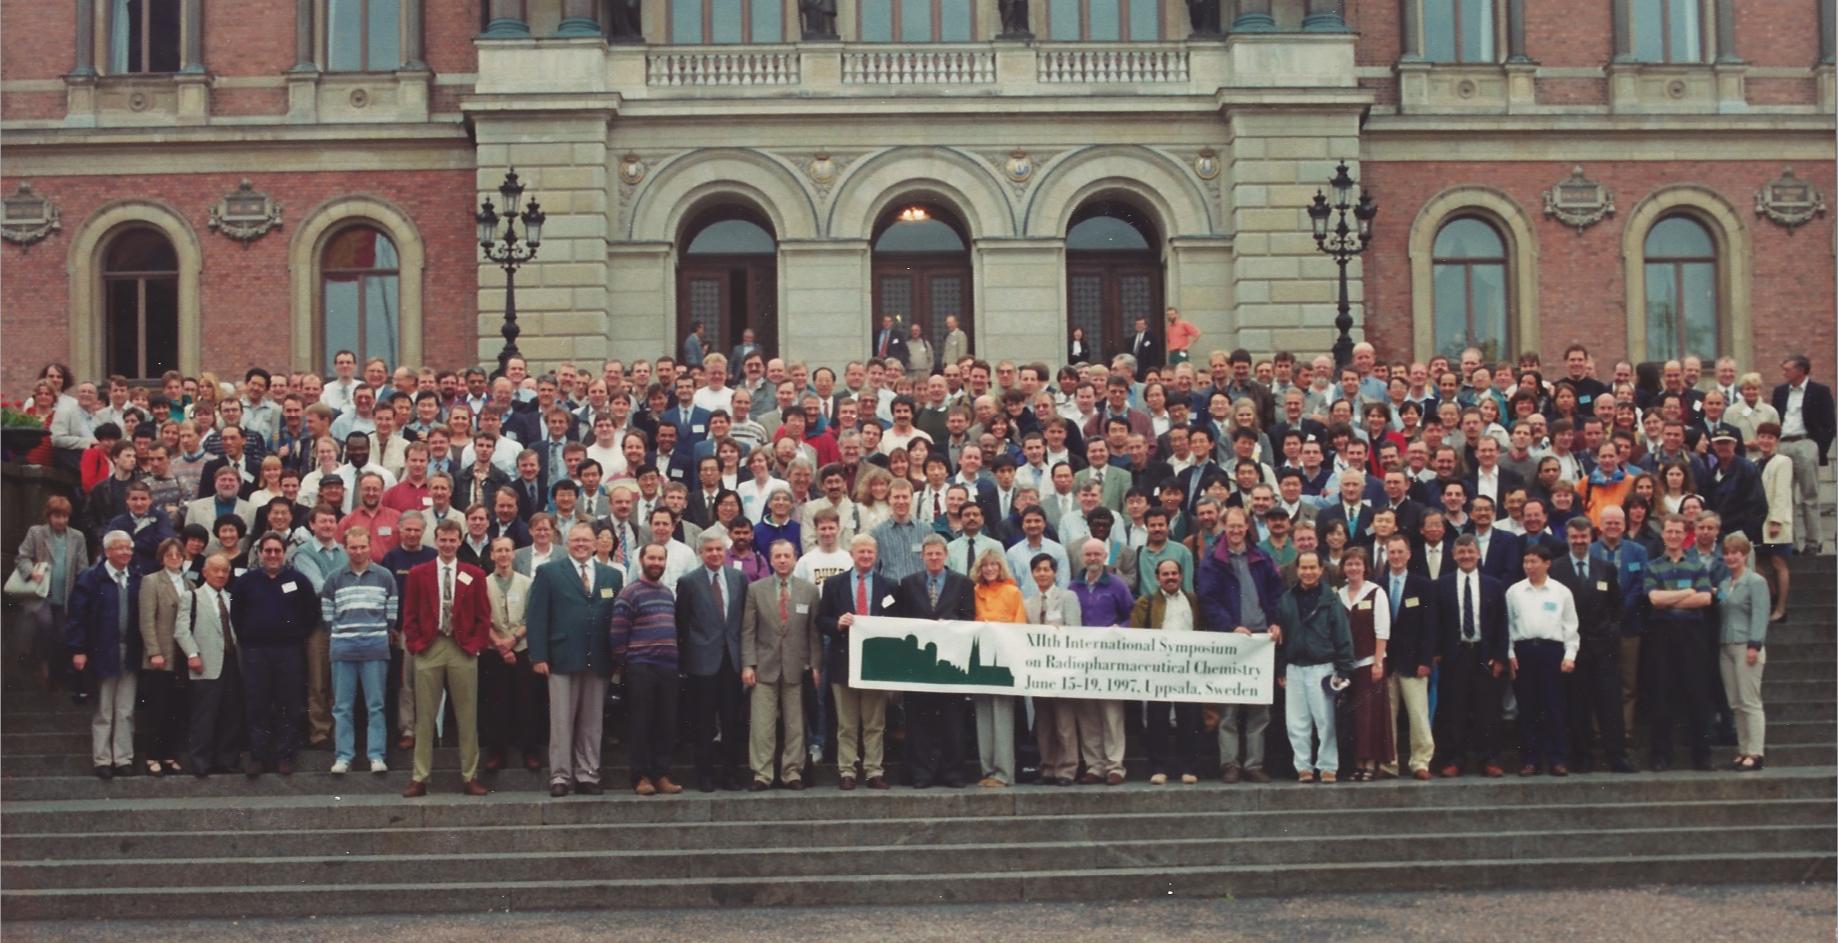 Uppsala, 1997